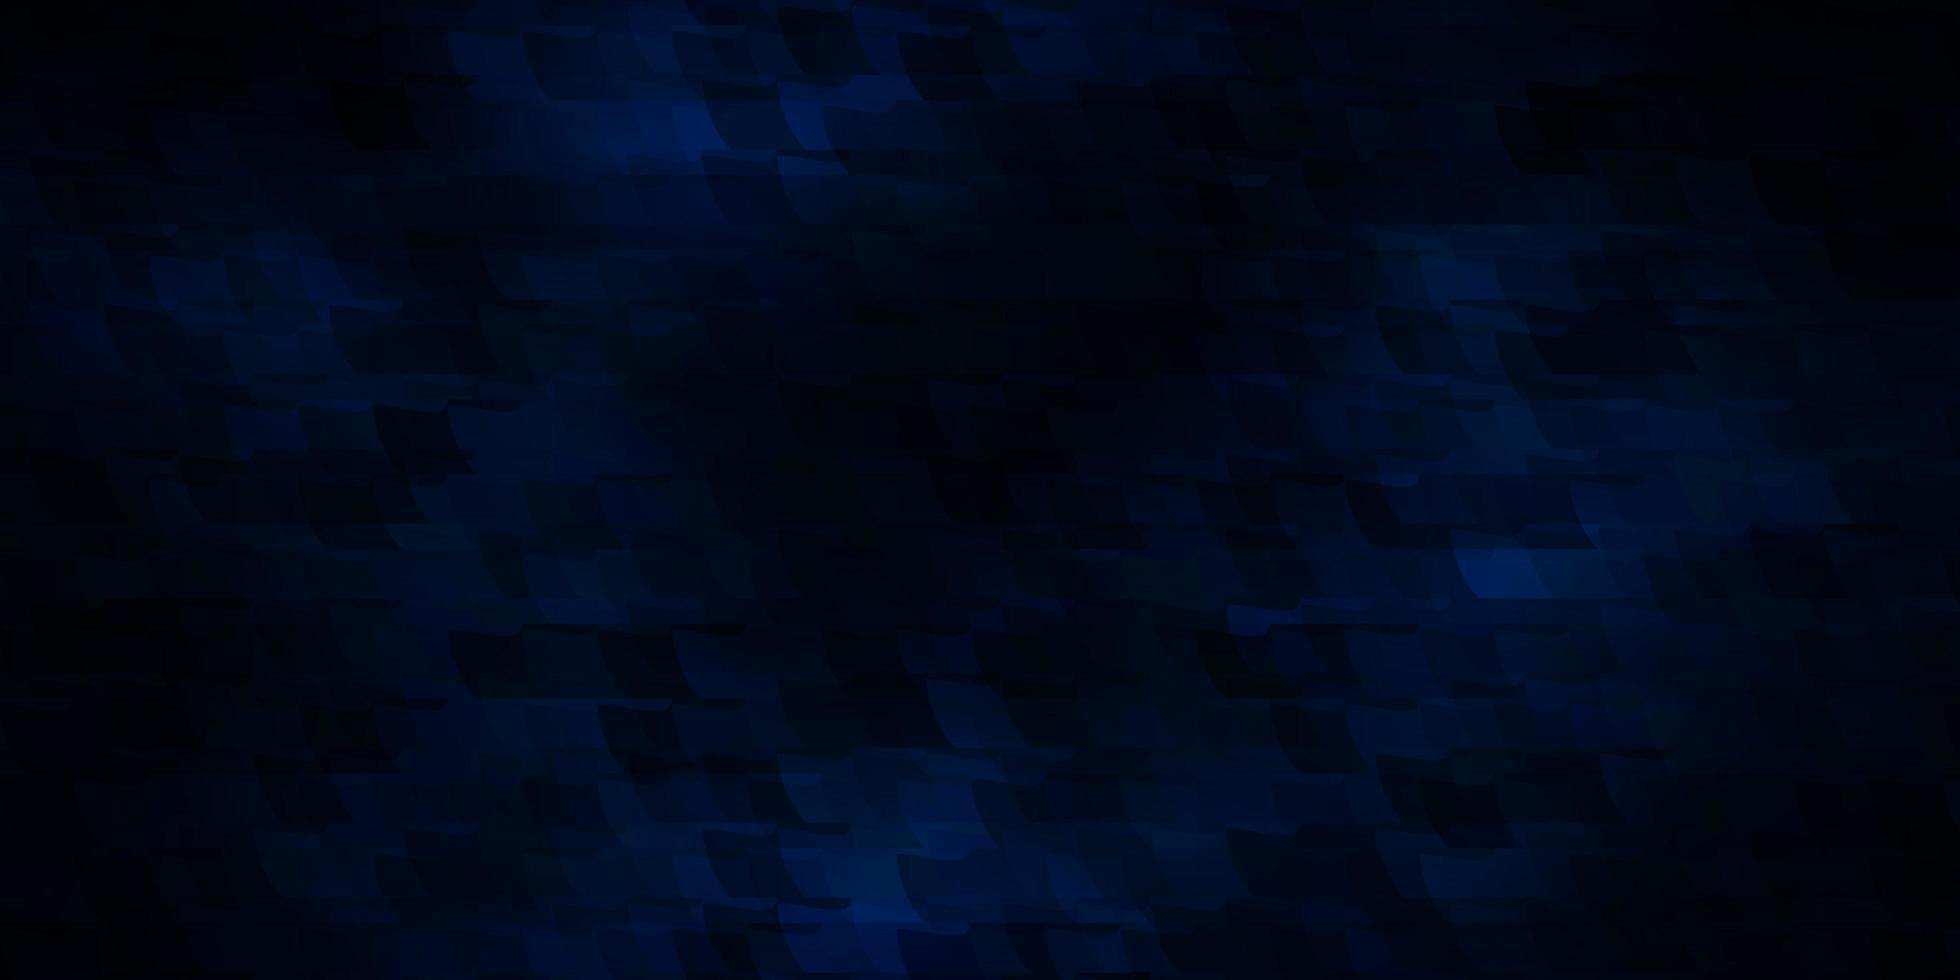 fundo cinza escuro do vetor com retângulos.